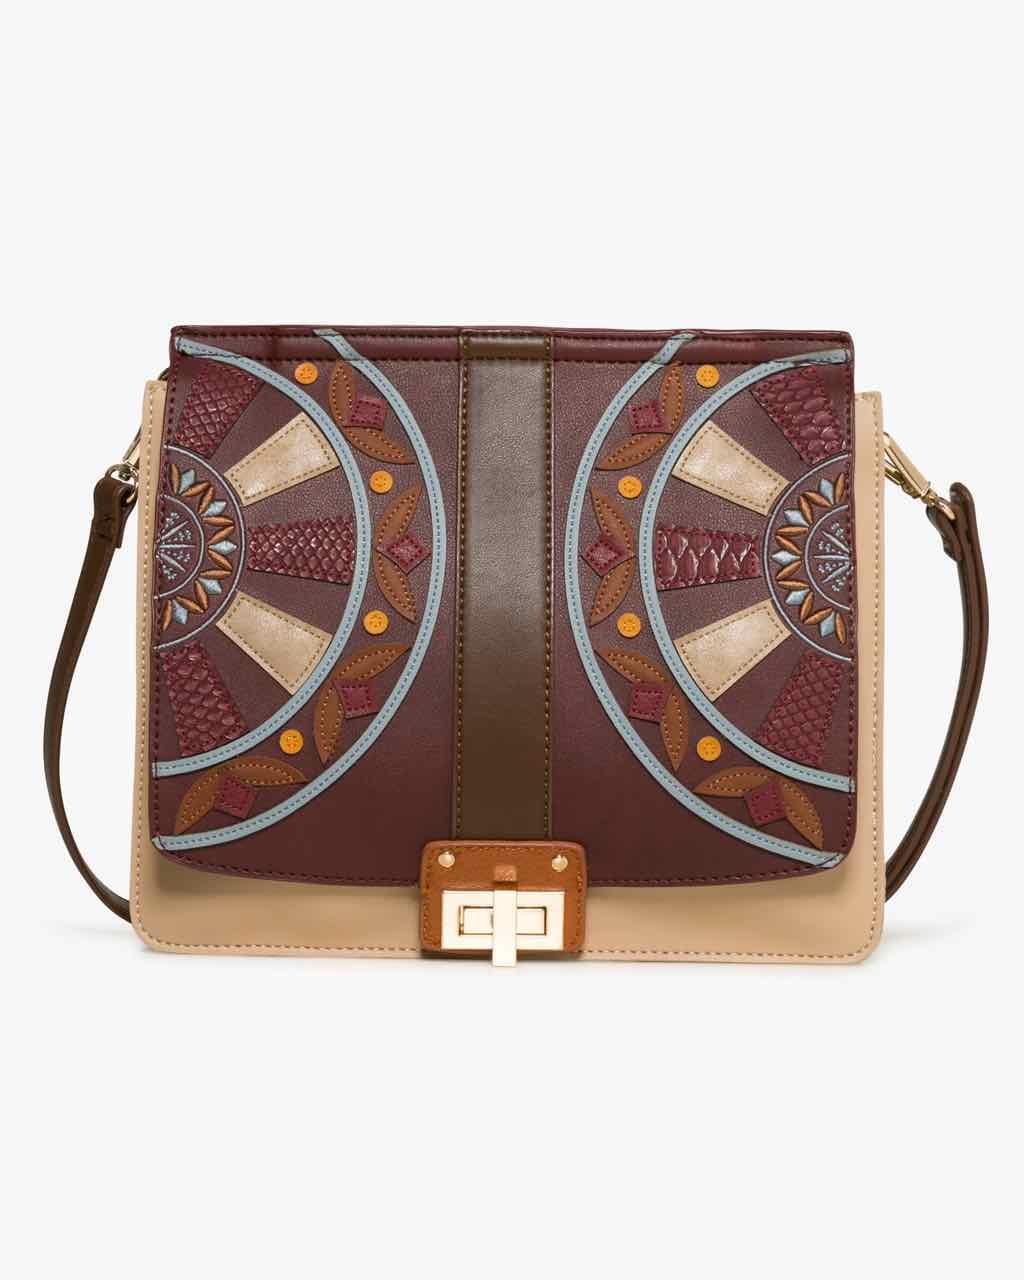 17WAXPKA_3006 Desigual Bag Amberes Celia Buy Online